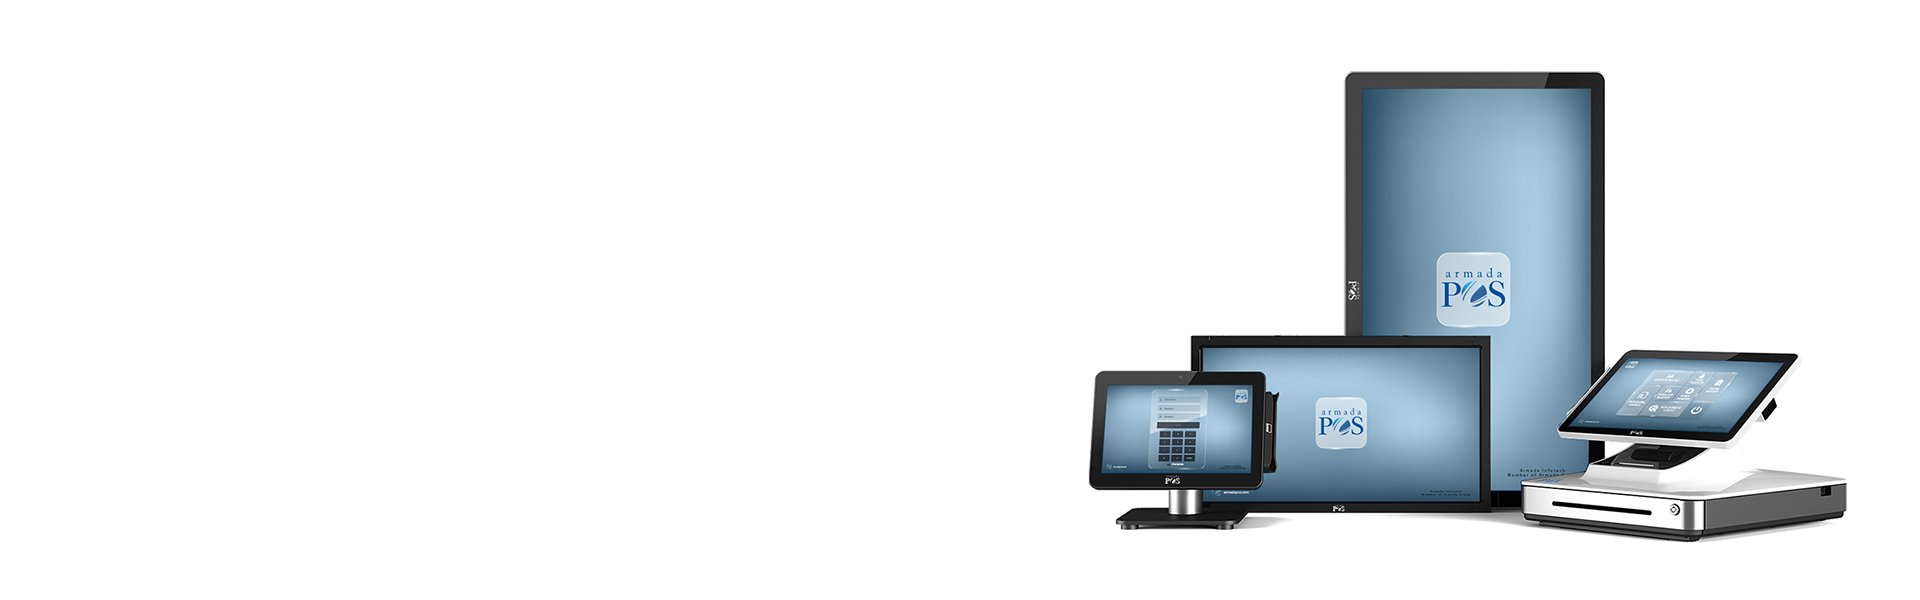 homepage-slider-1